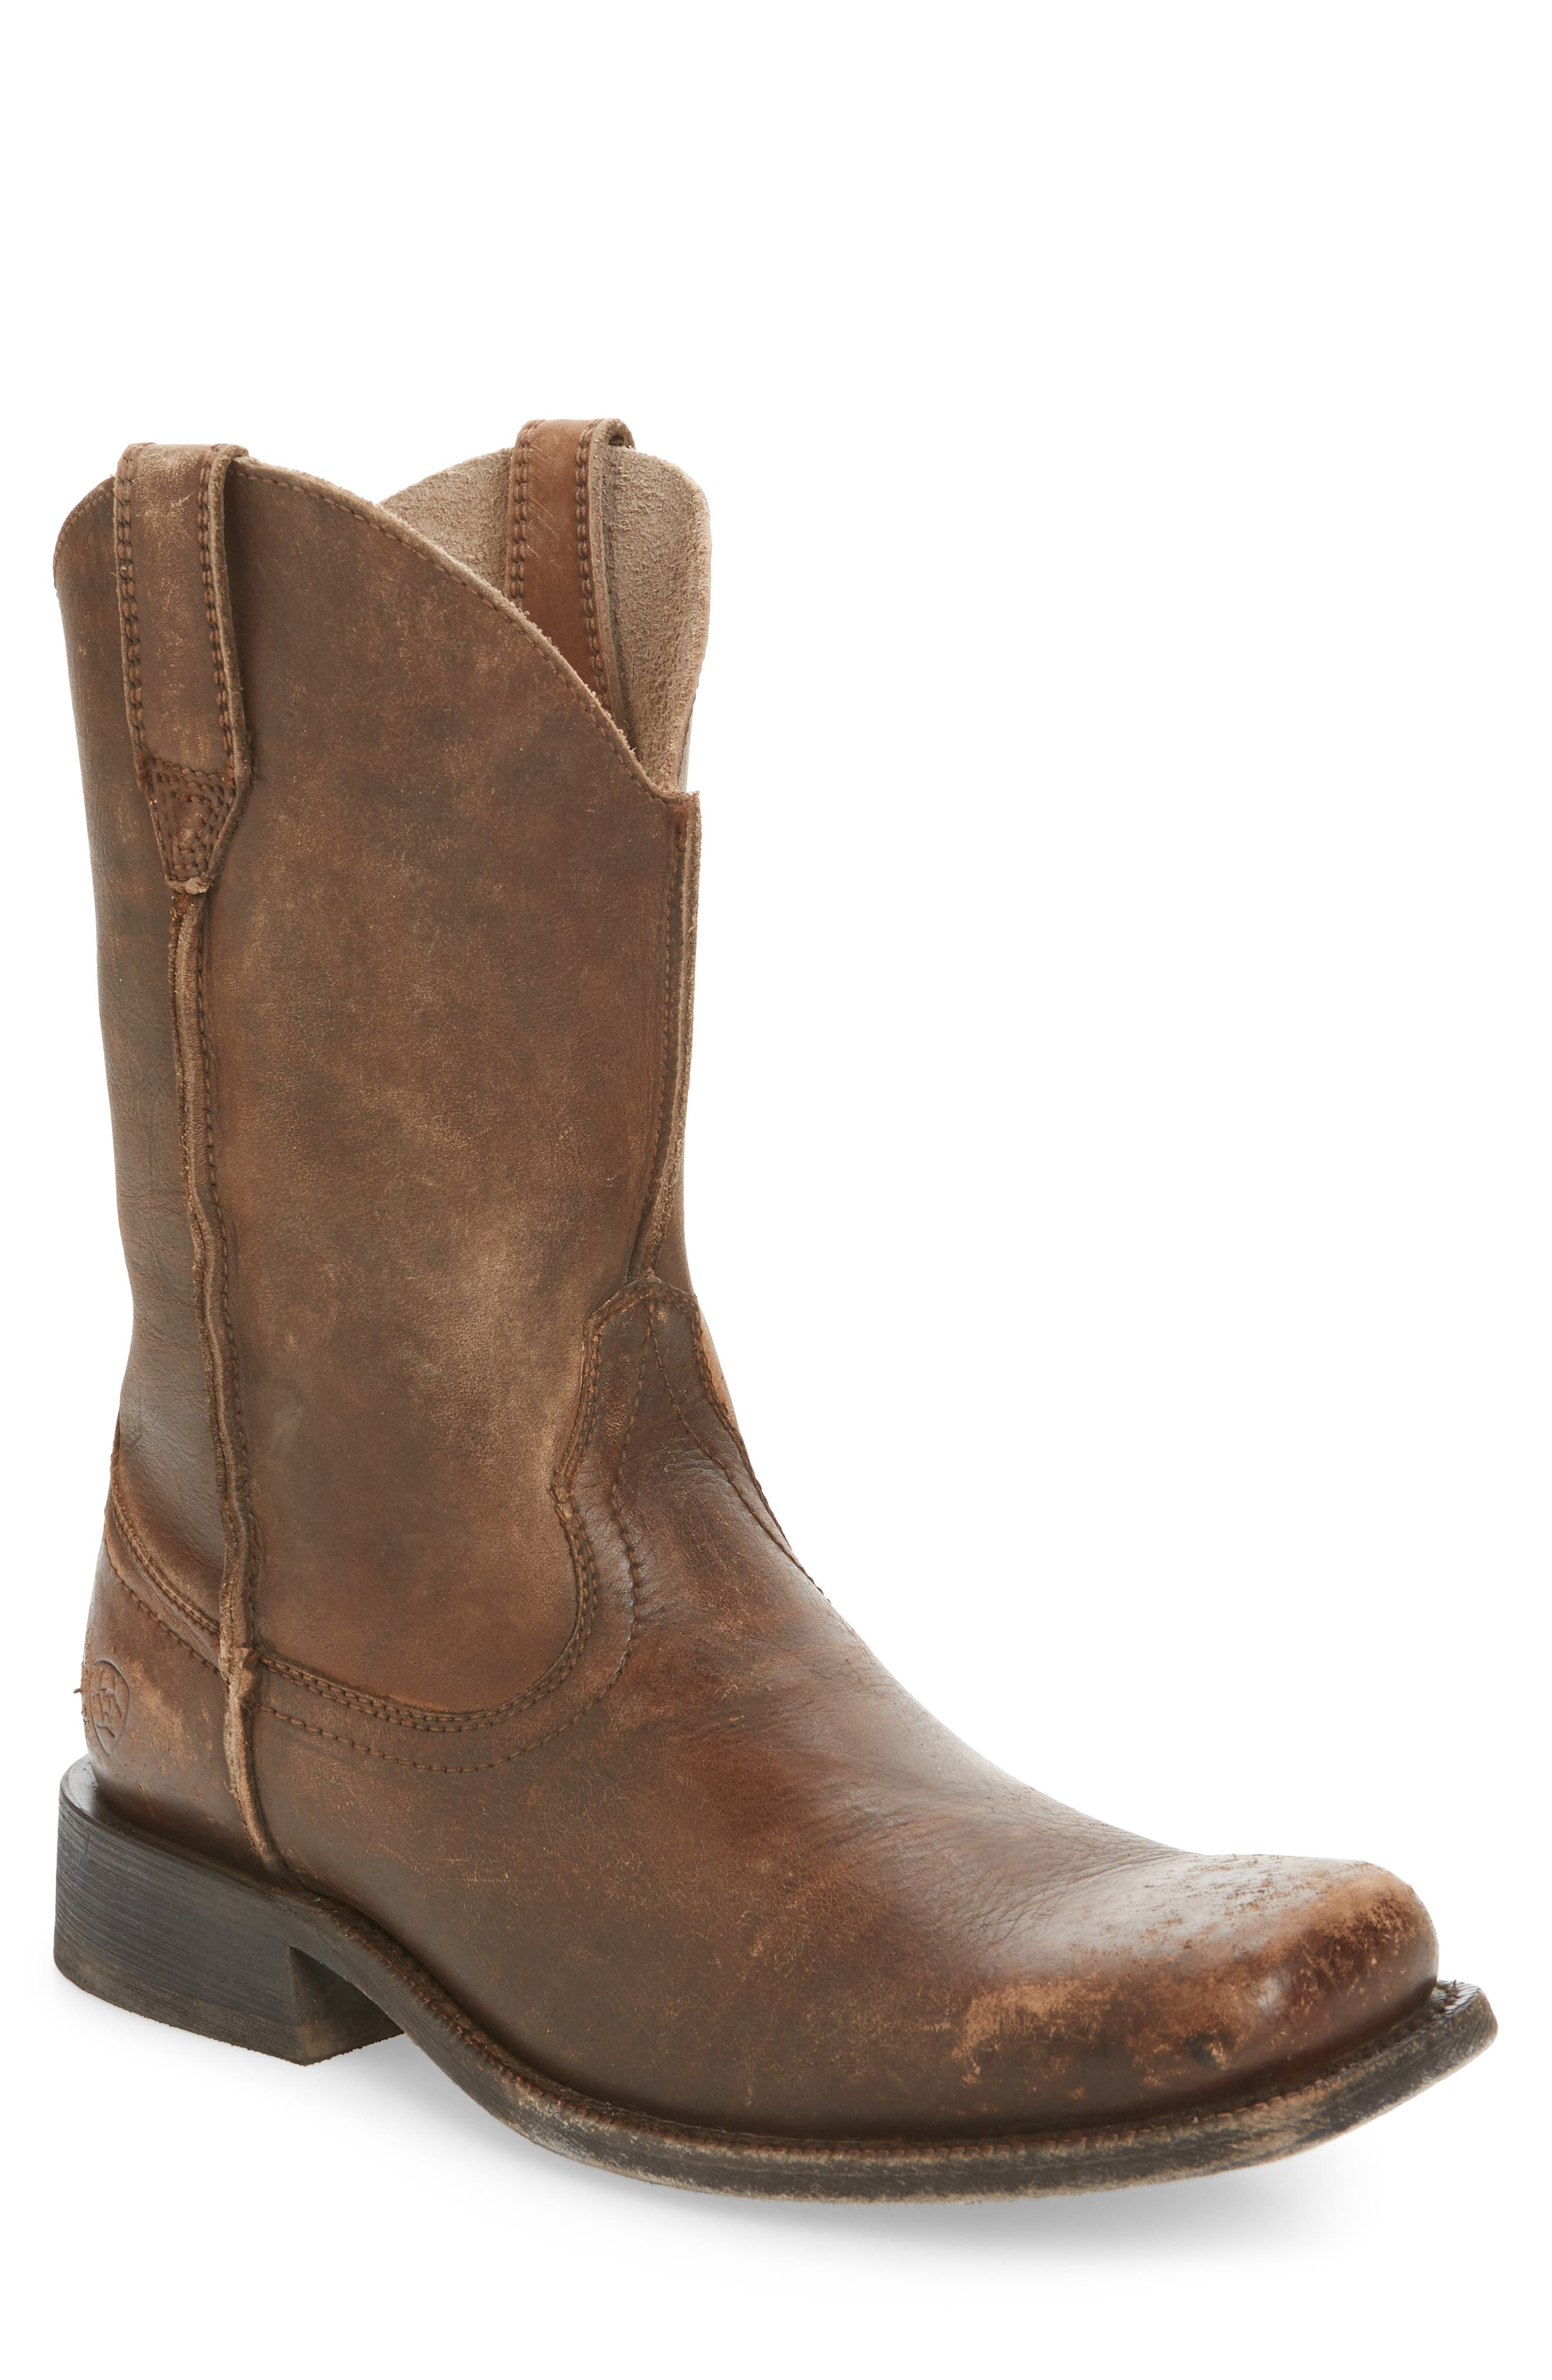 Ariat Rambler Western Boot- Brown